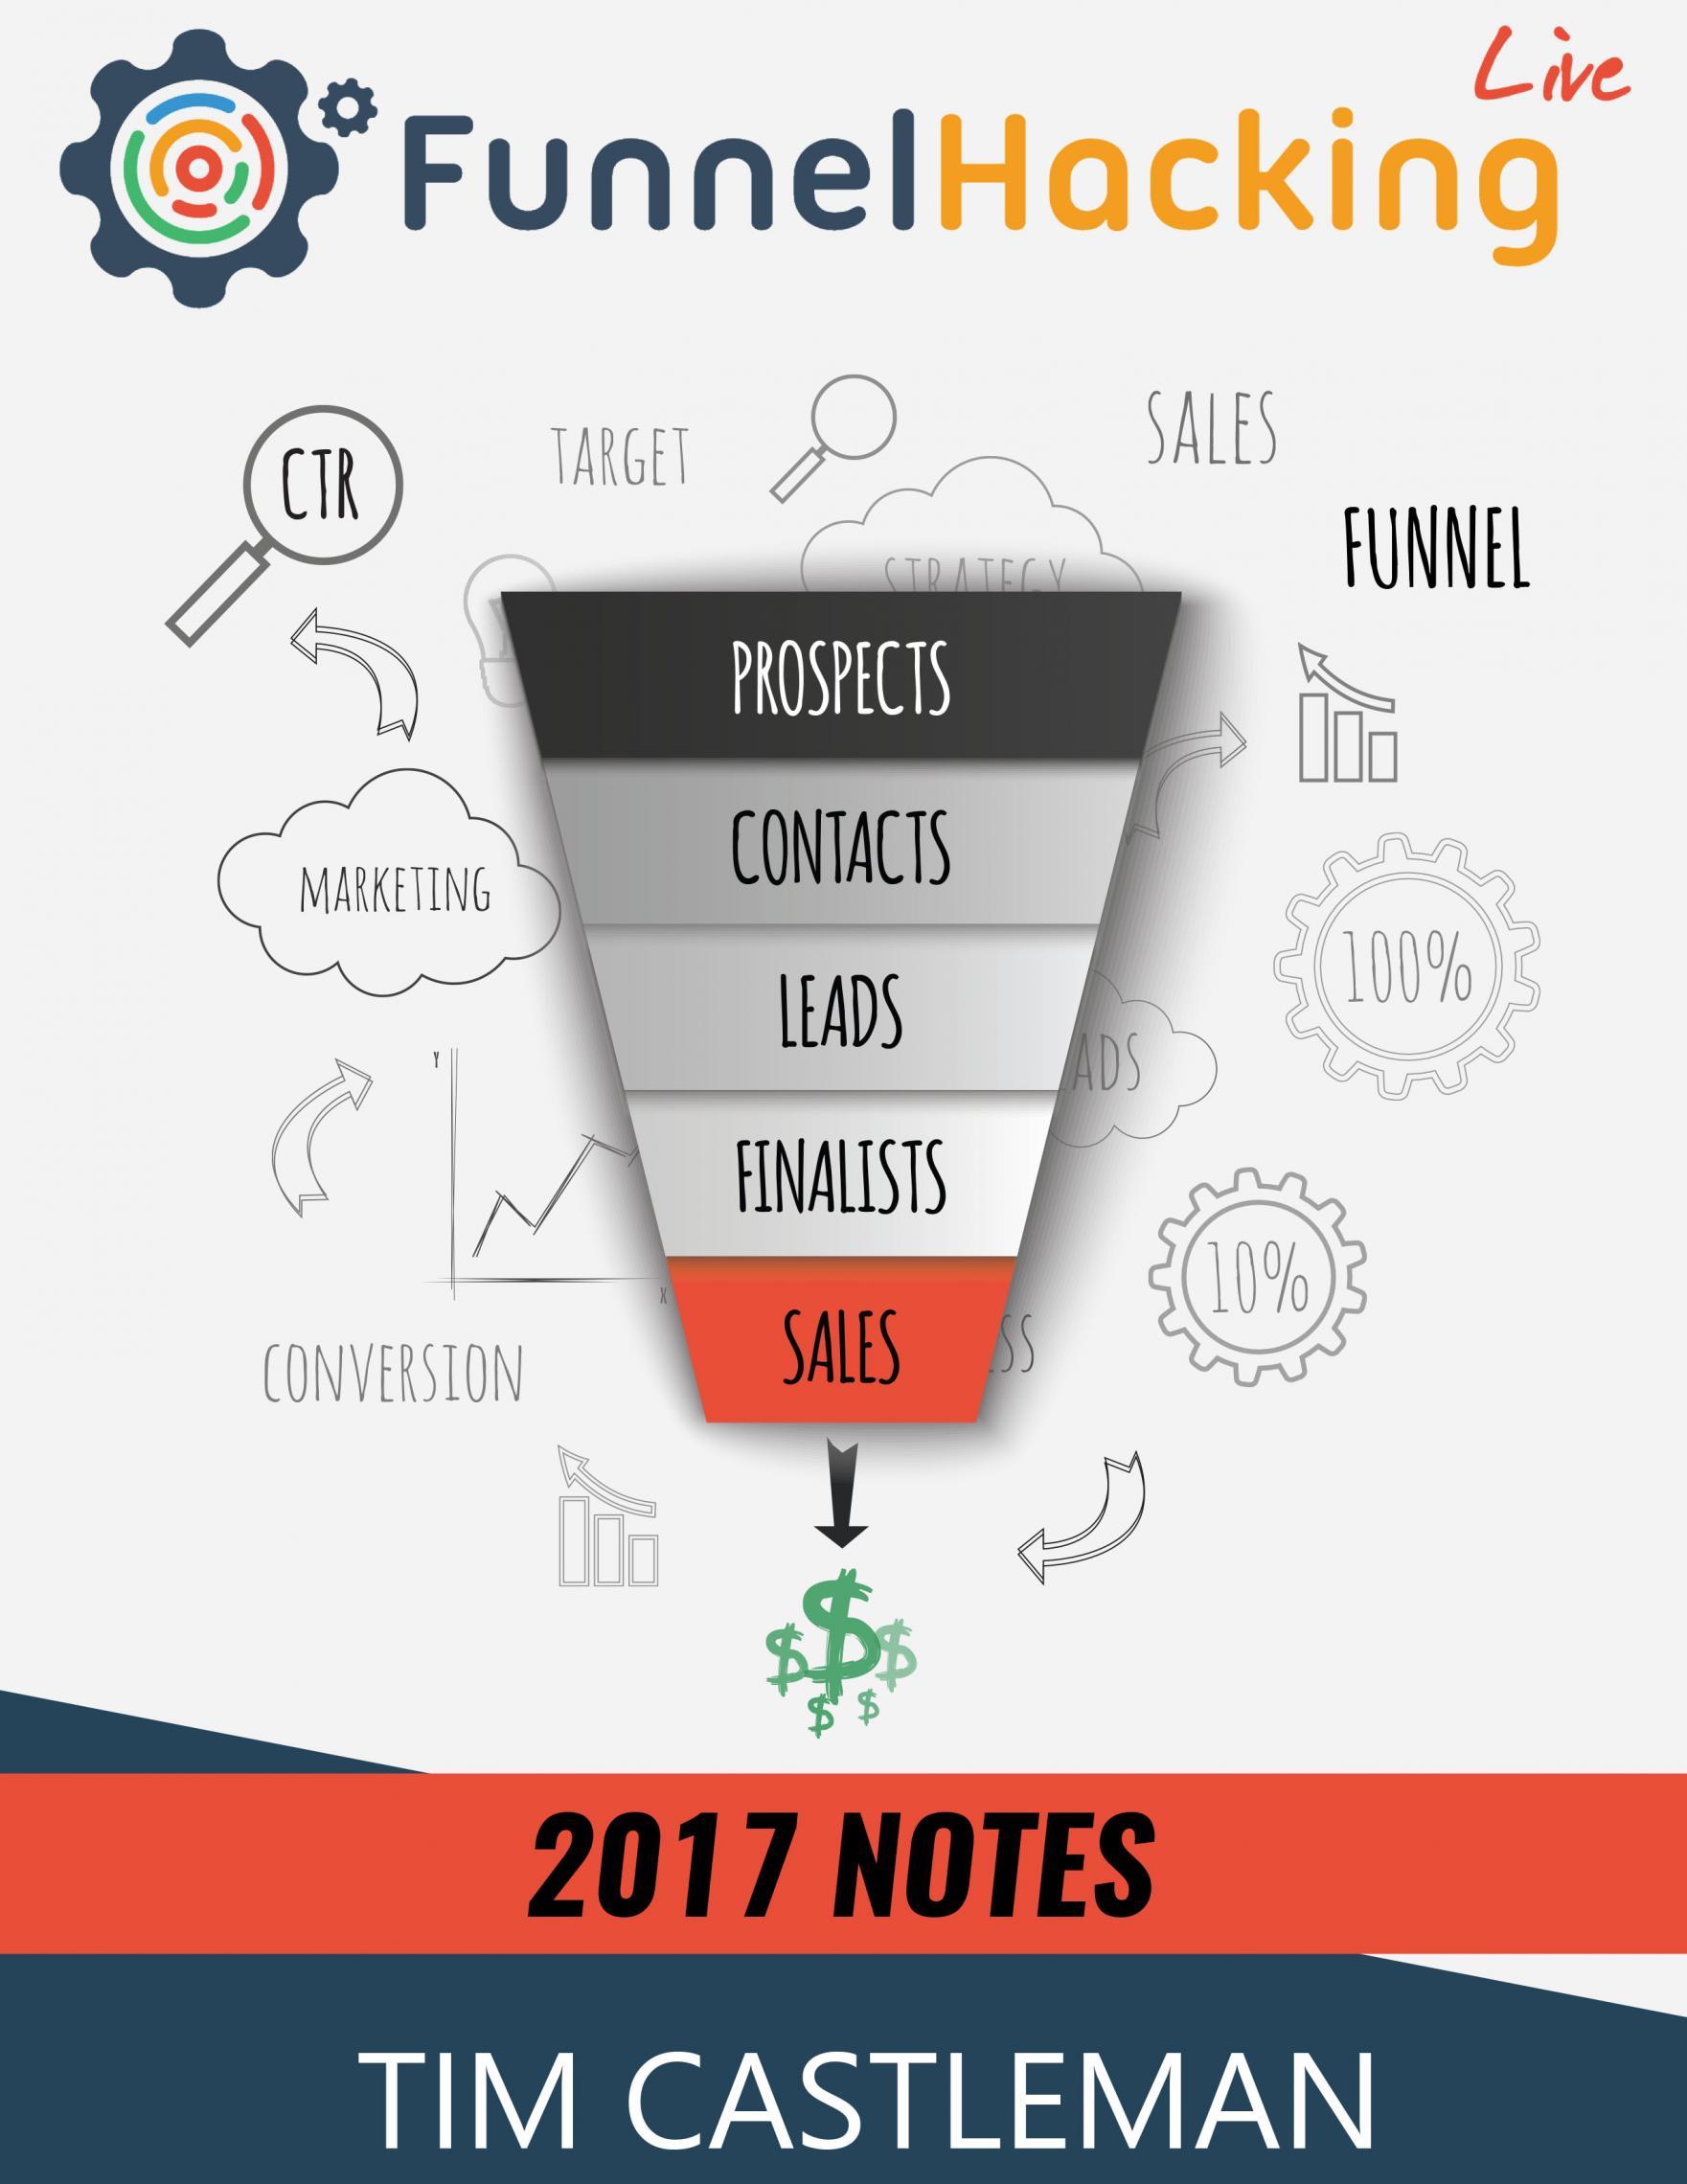 Email/ List-Building Funnels、Membership Funnels、Ecommerce Funnels、Amazon Funnels、Supplement Funnels、Event Funnels、Social Webinar Funnels、The Podcast Funnel(2017 Funnel Hacking Live Notes)